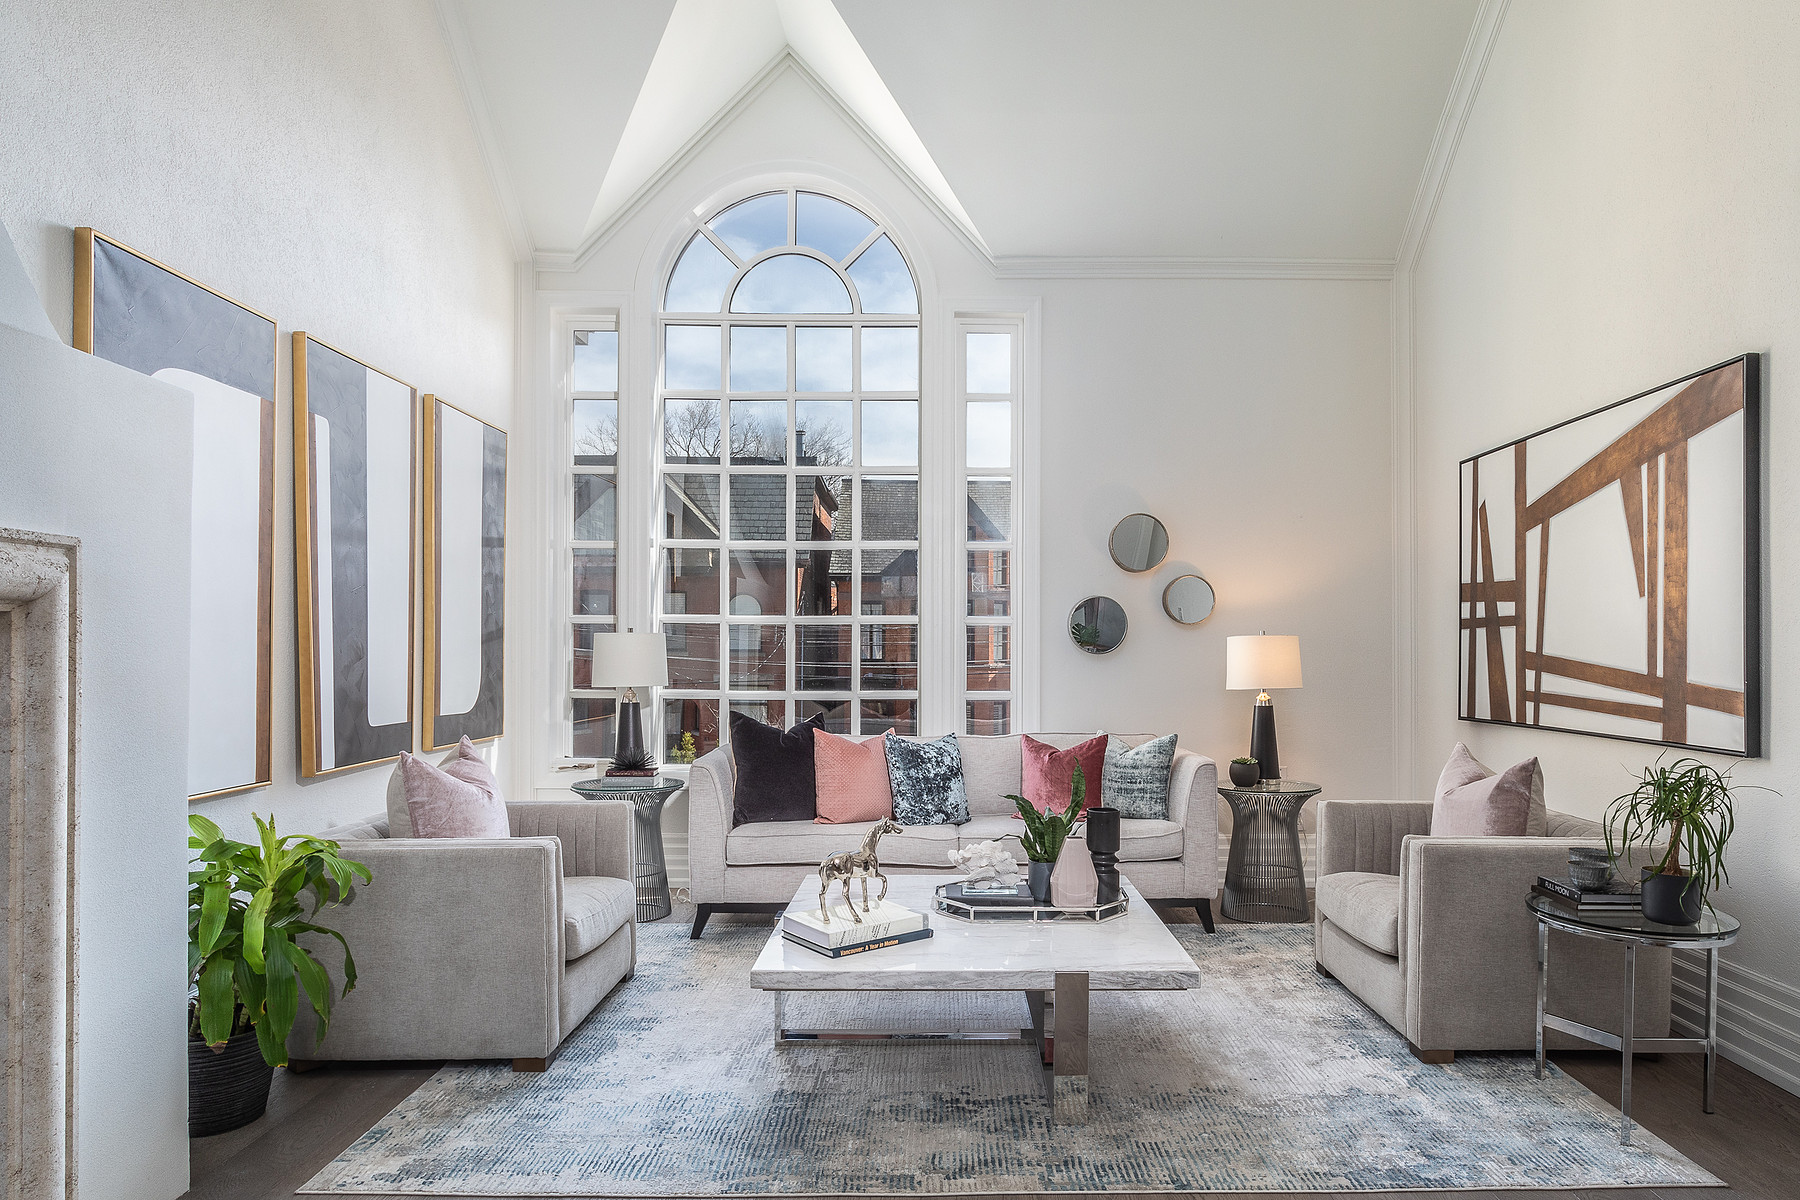 Single Family Home for Sale at Toronto, Greater Toronto Area 44-46 Bernard Ave Toronto, Ontario M5R 1R2 Canada